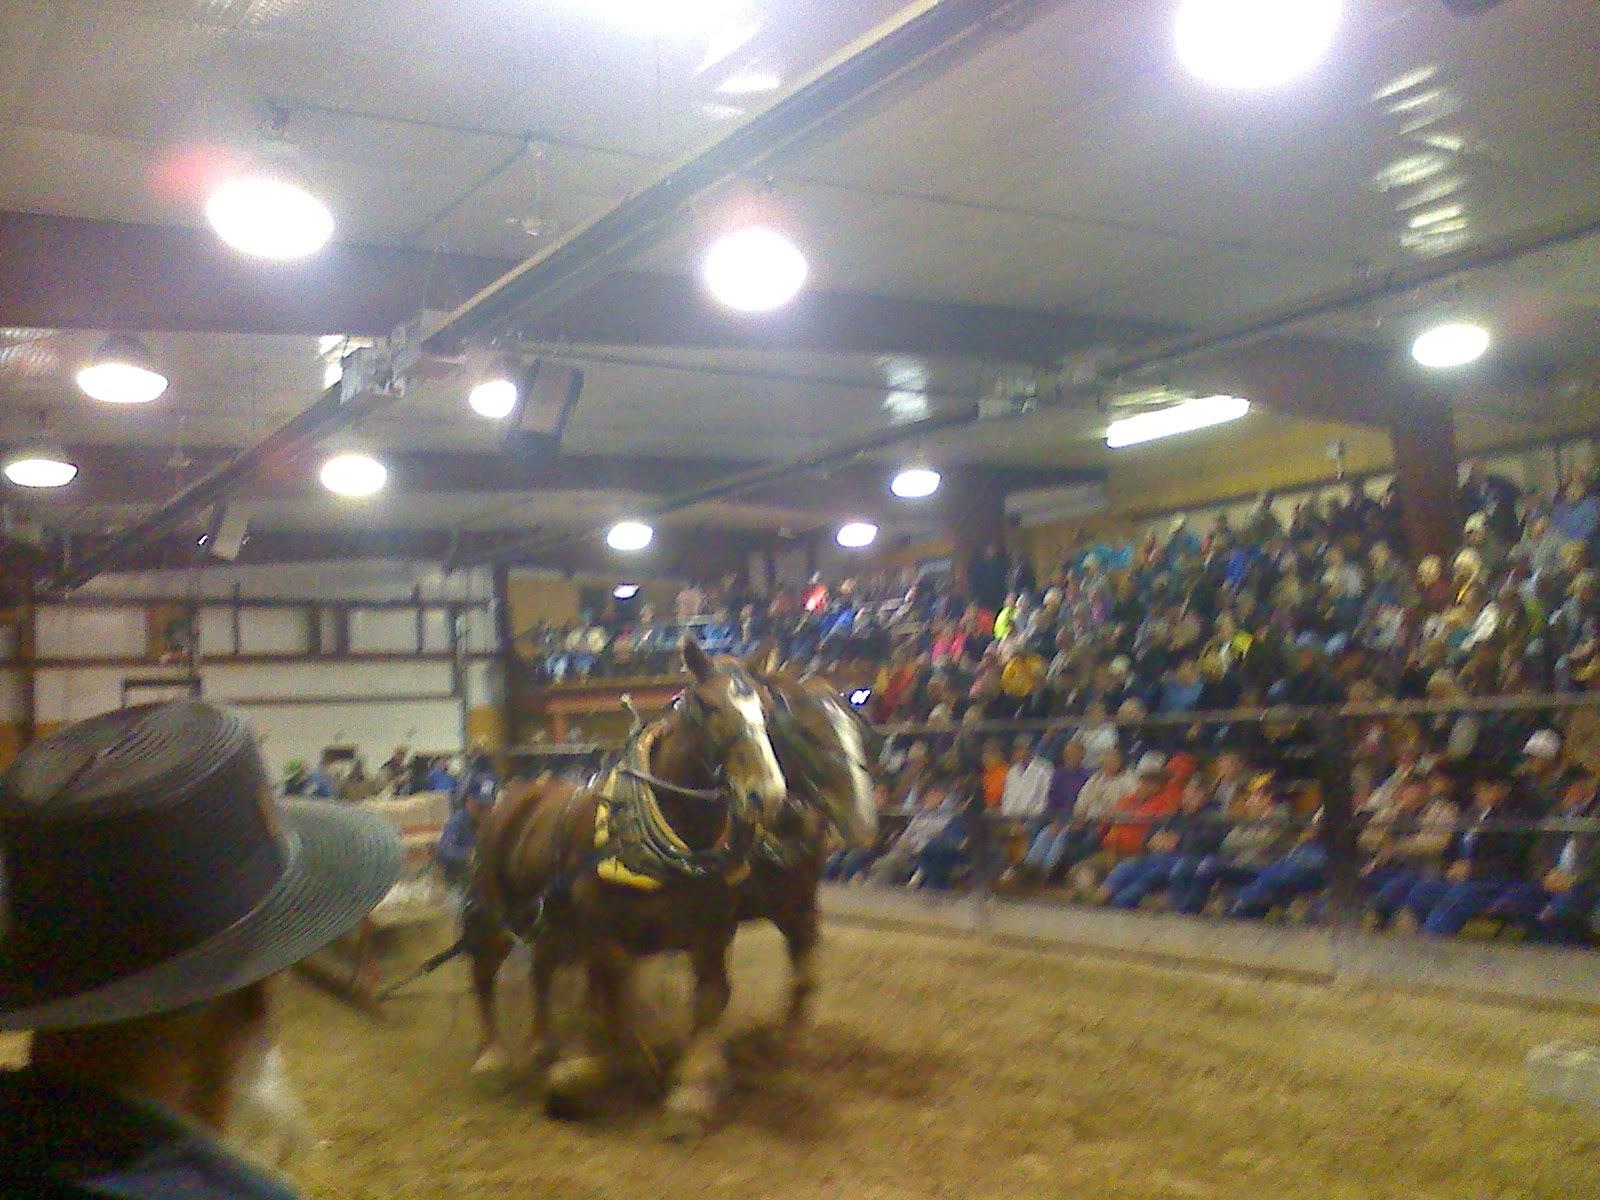 Amish Horses: Amish Horses For Sale